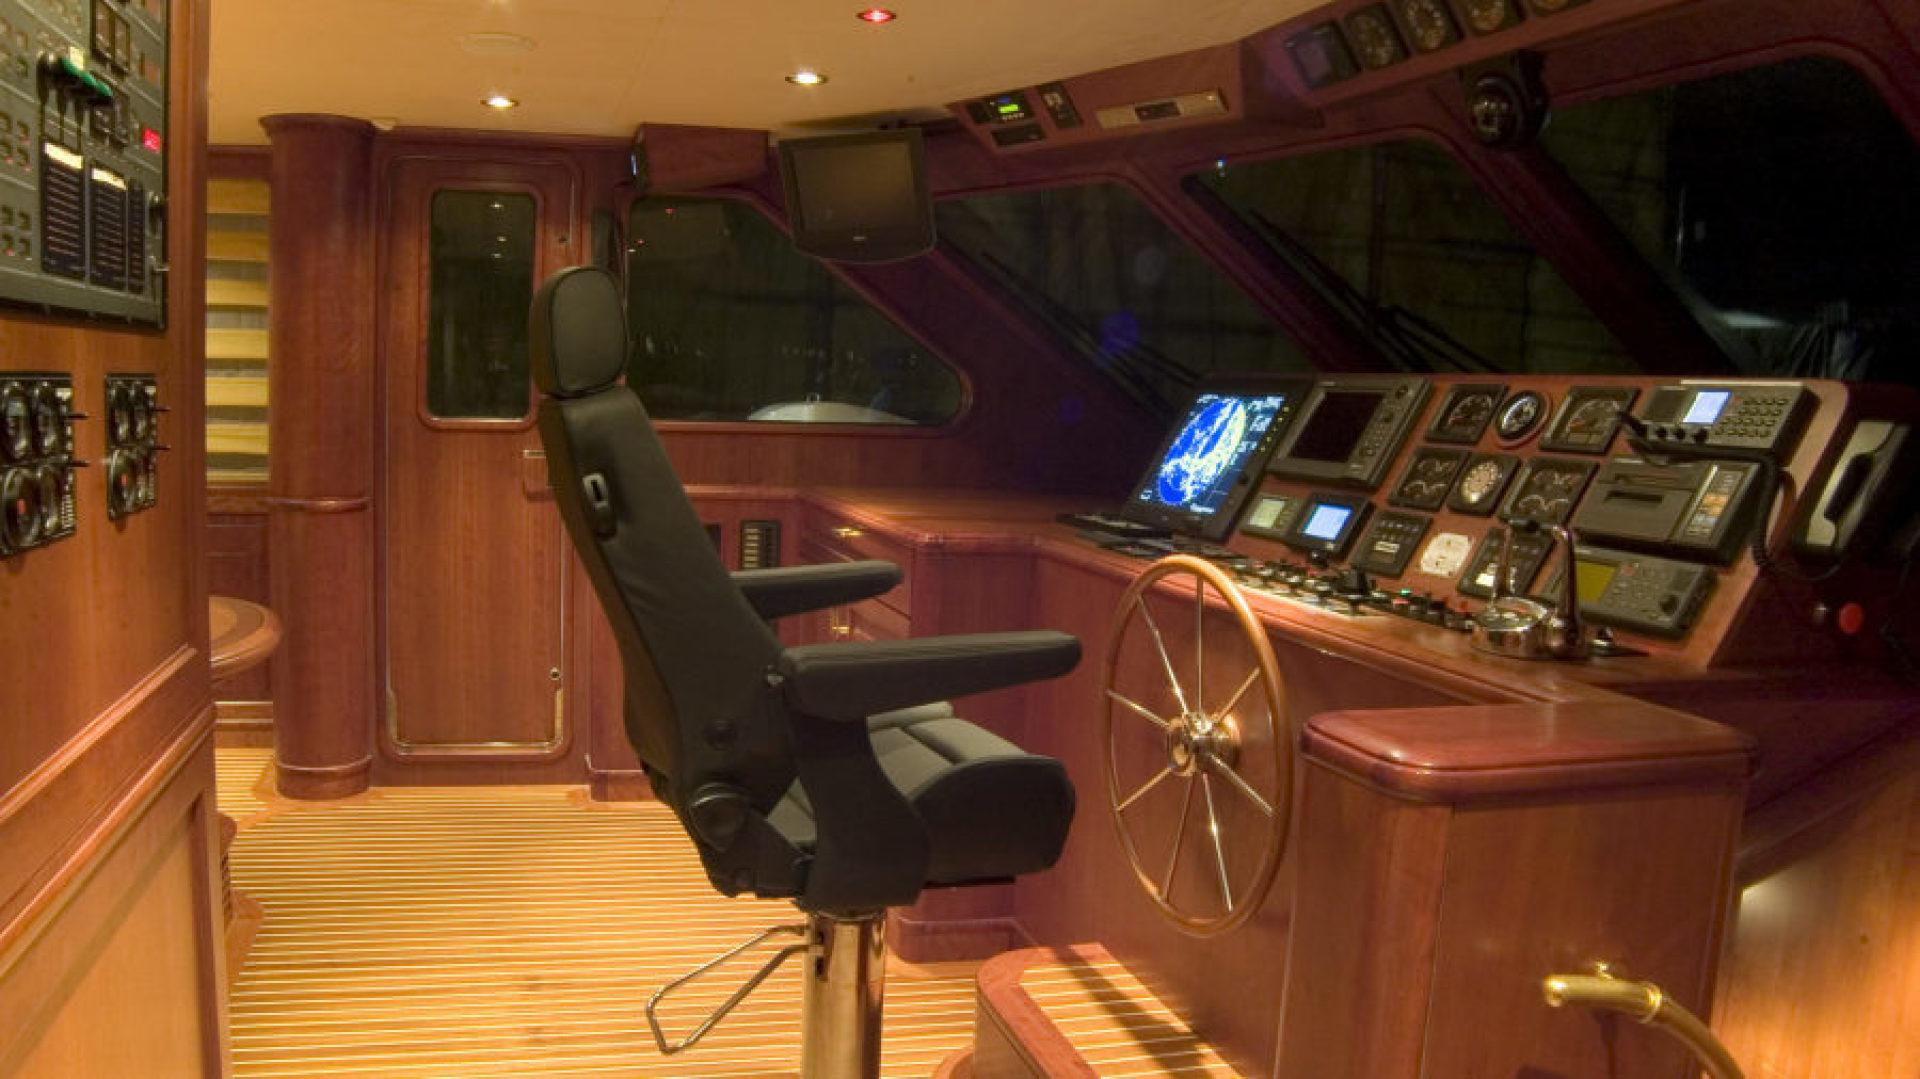 Conrad Shipyard-88 Motor Yacht 2005-Chillin Fort Lauderdale-Florida-United States-Conrad Motor Yacht 2005 Chillin Pilothouse-1537341 | Thumbnail